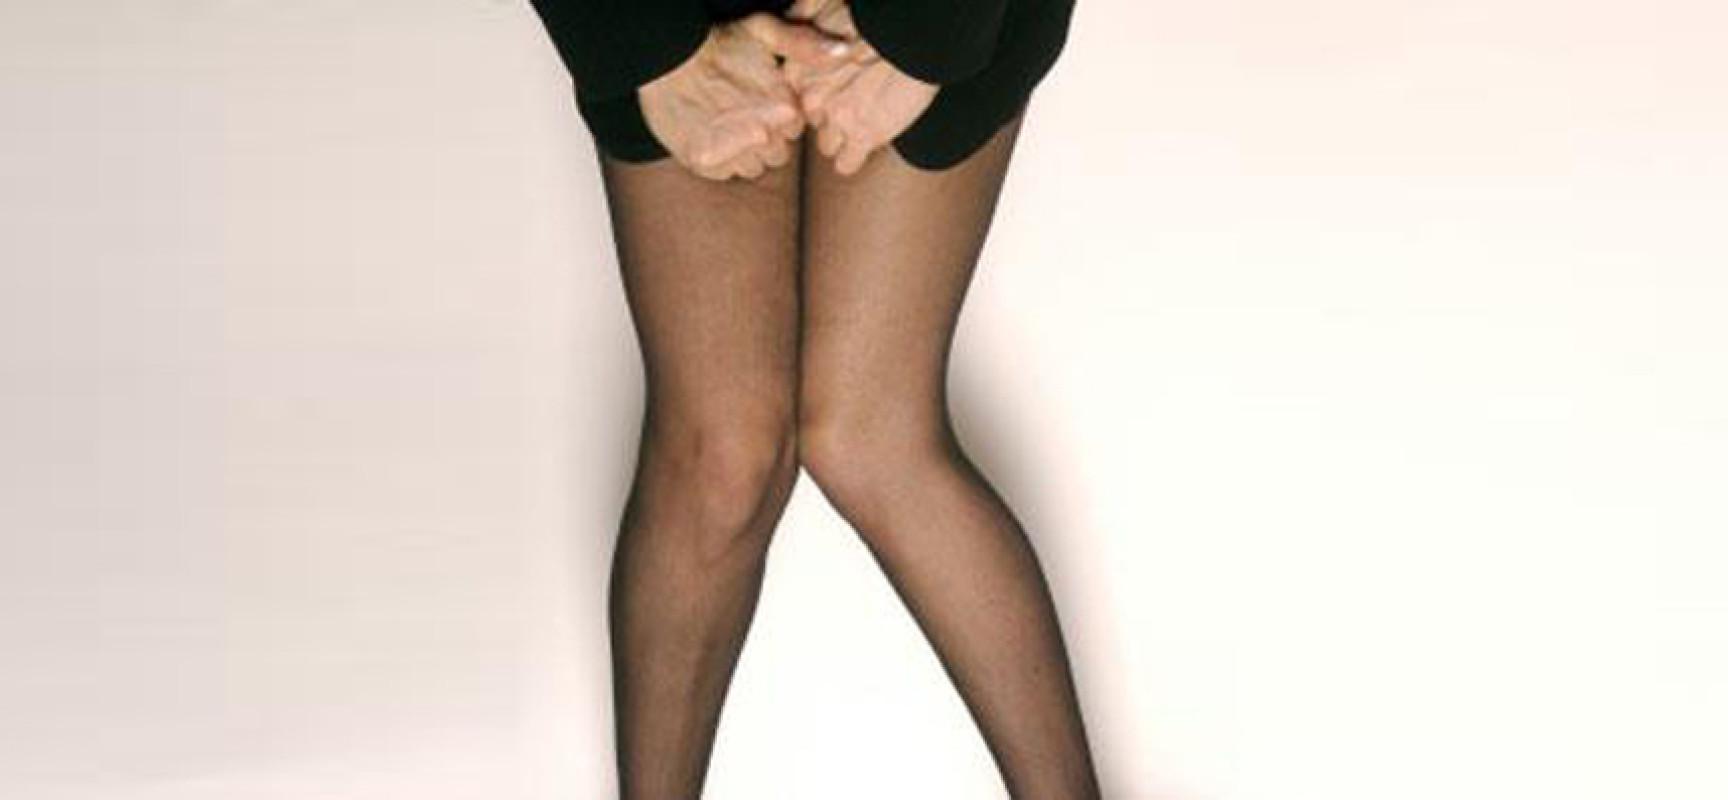 Диагностика недержание мочи у женщин